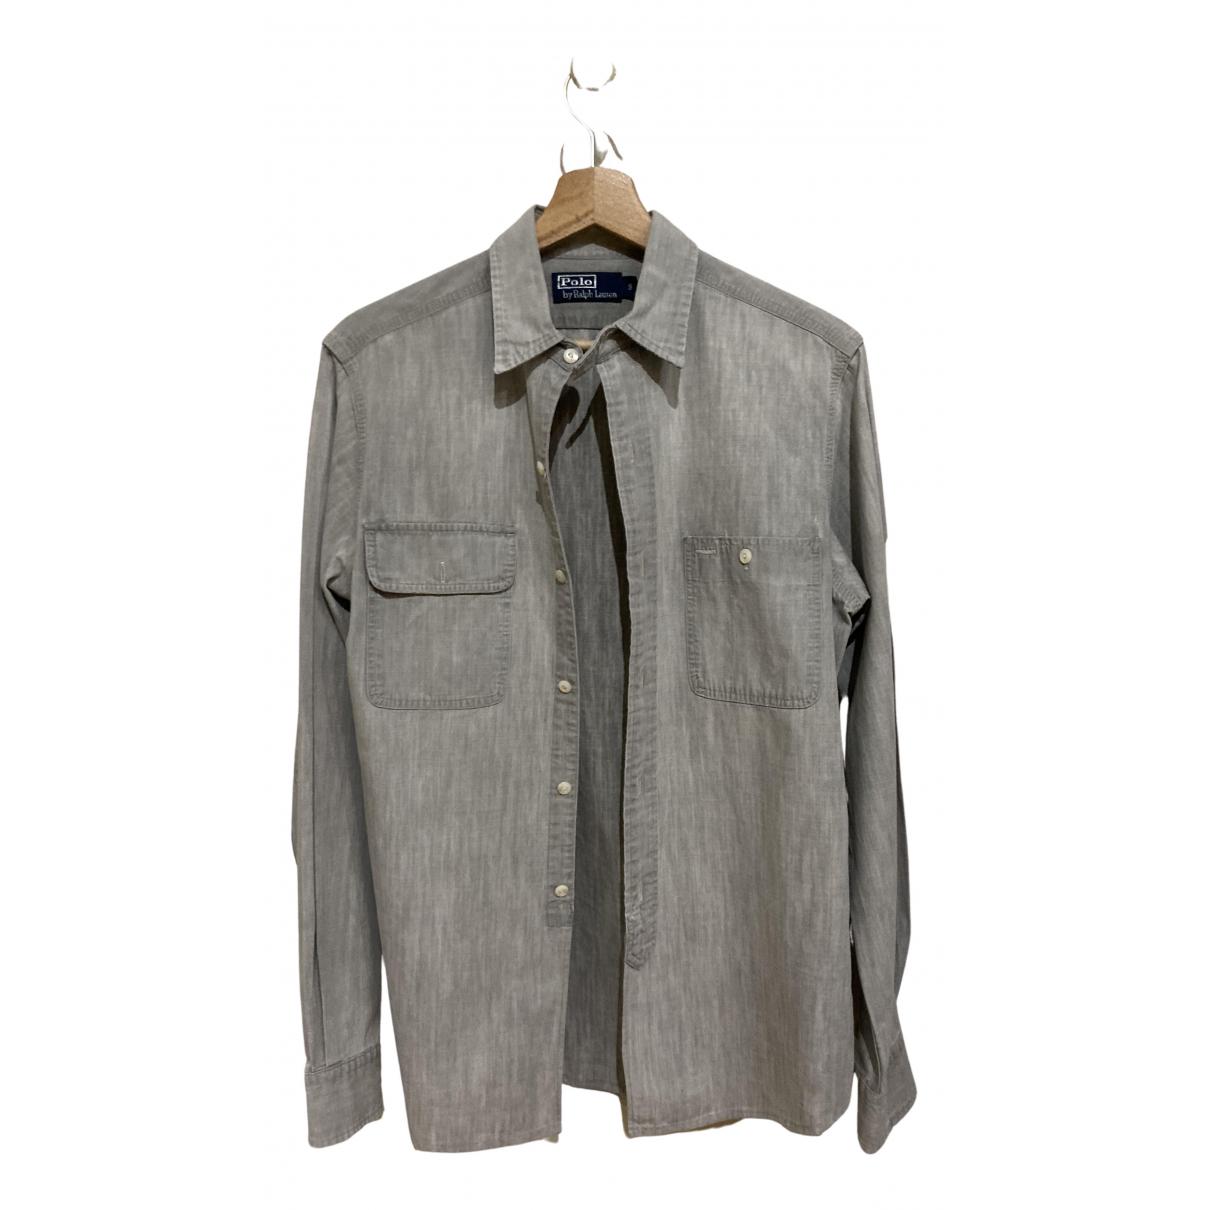 Polo Ralph Lauren N Grey Shirts for Men S International